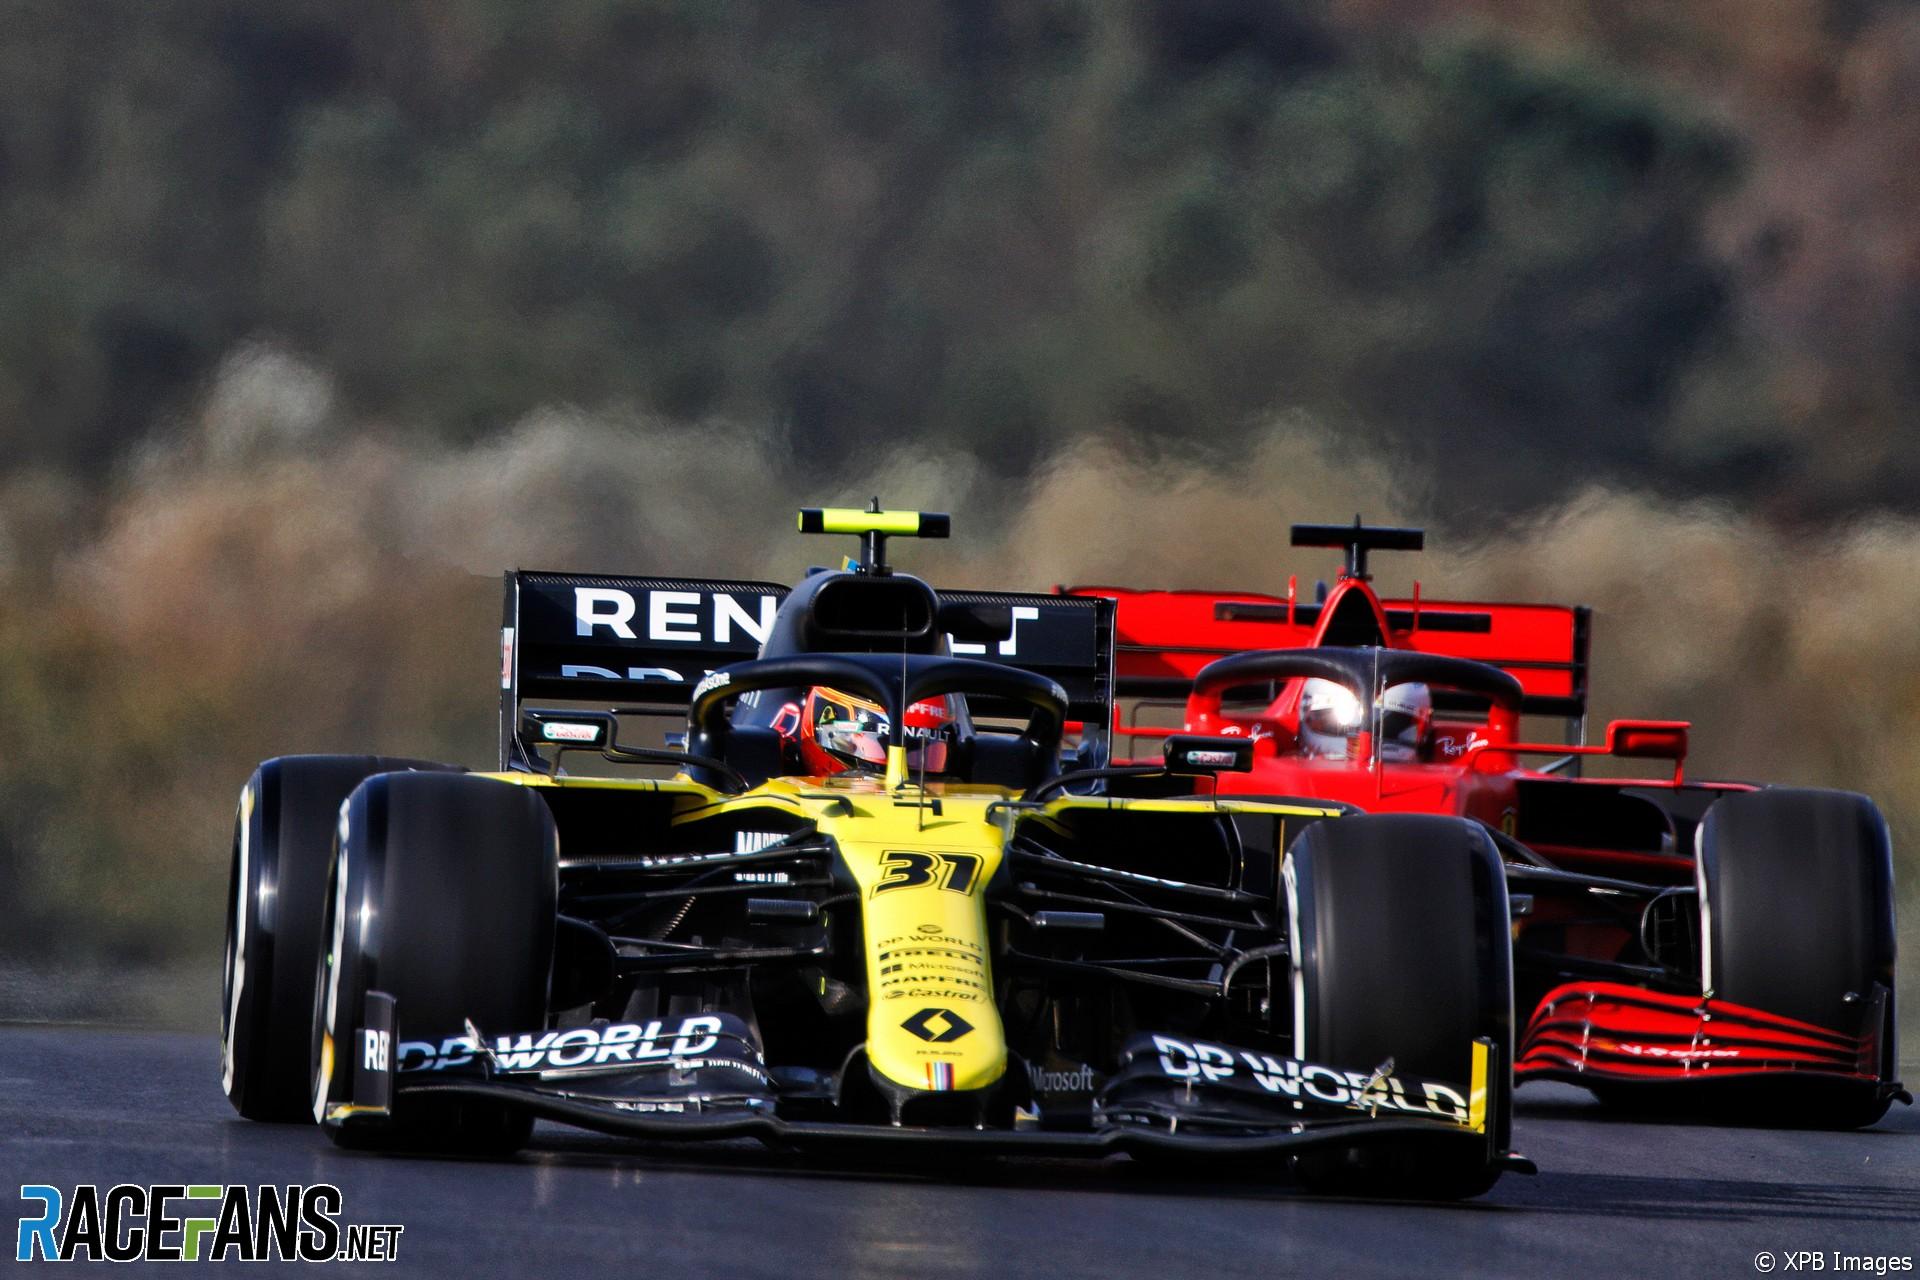 Esteban Ocon, Renault, Istanbul Park, 2020